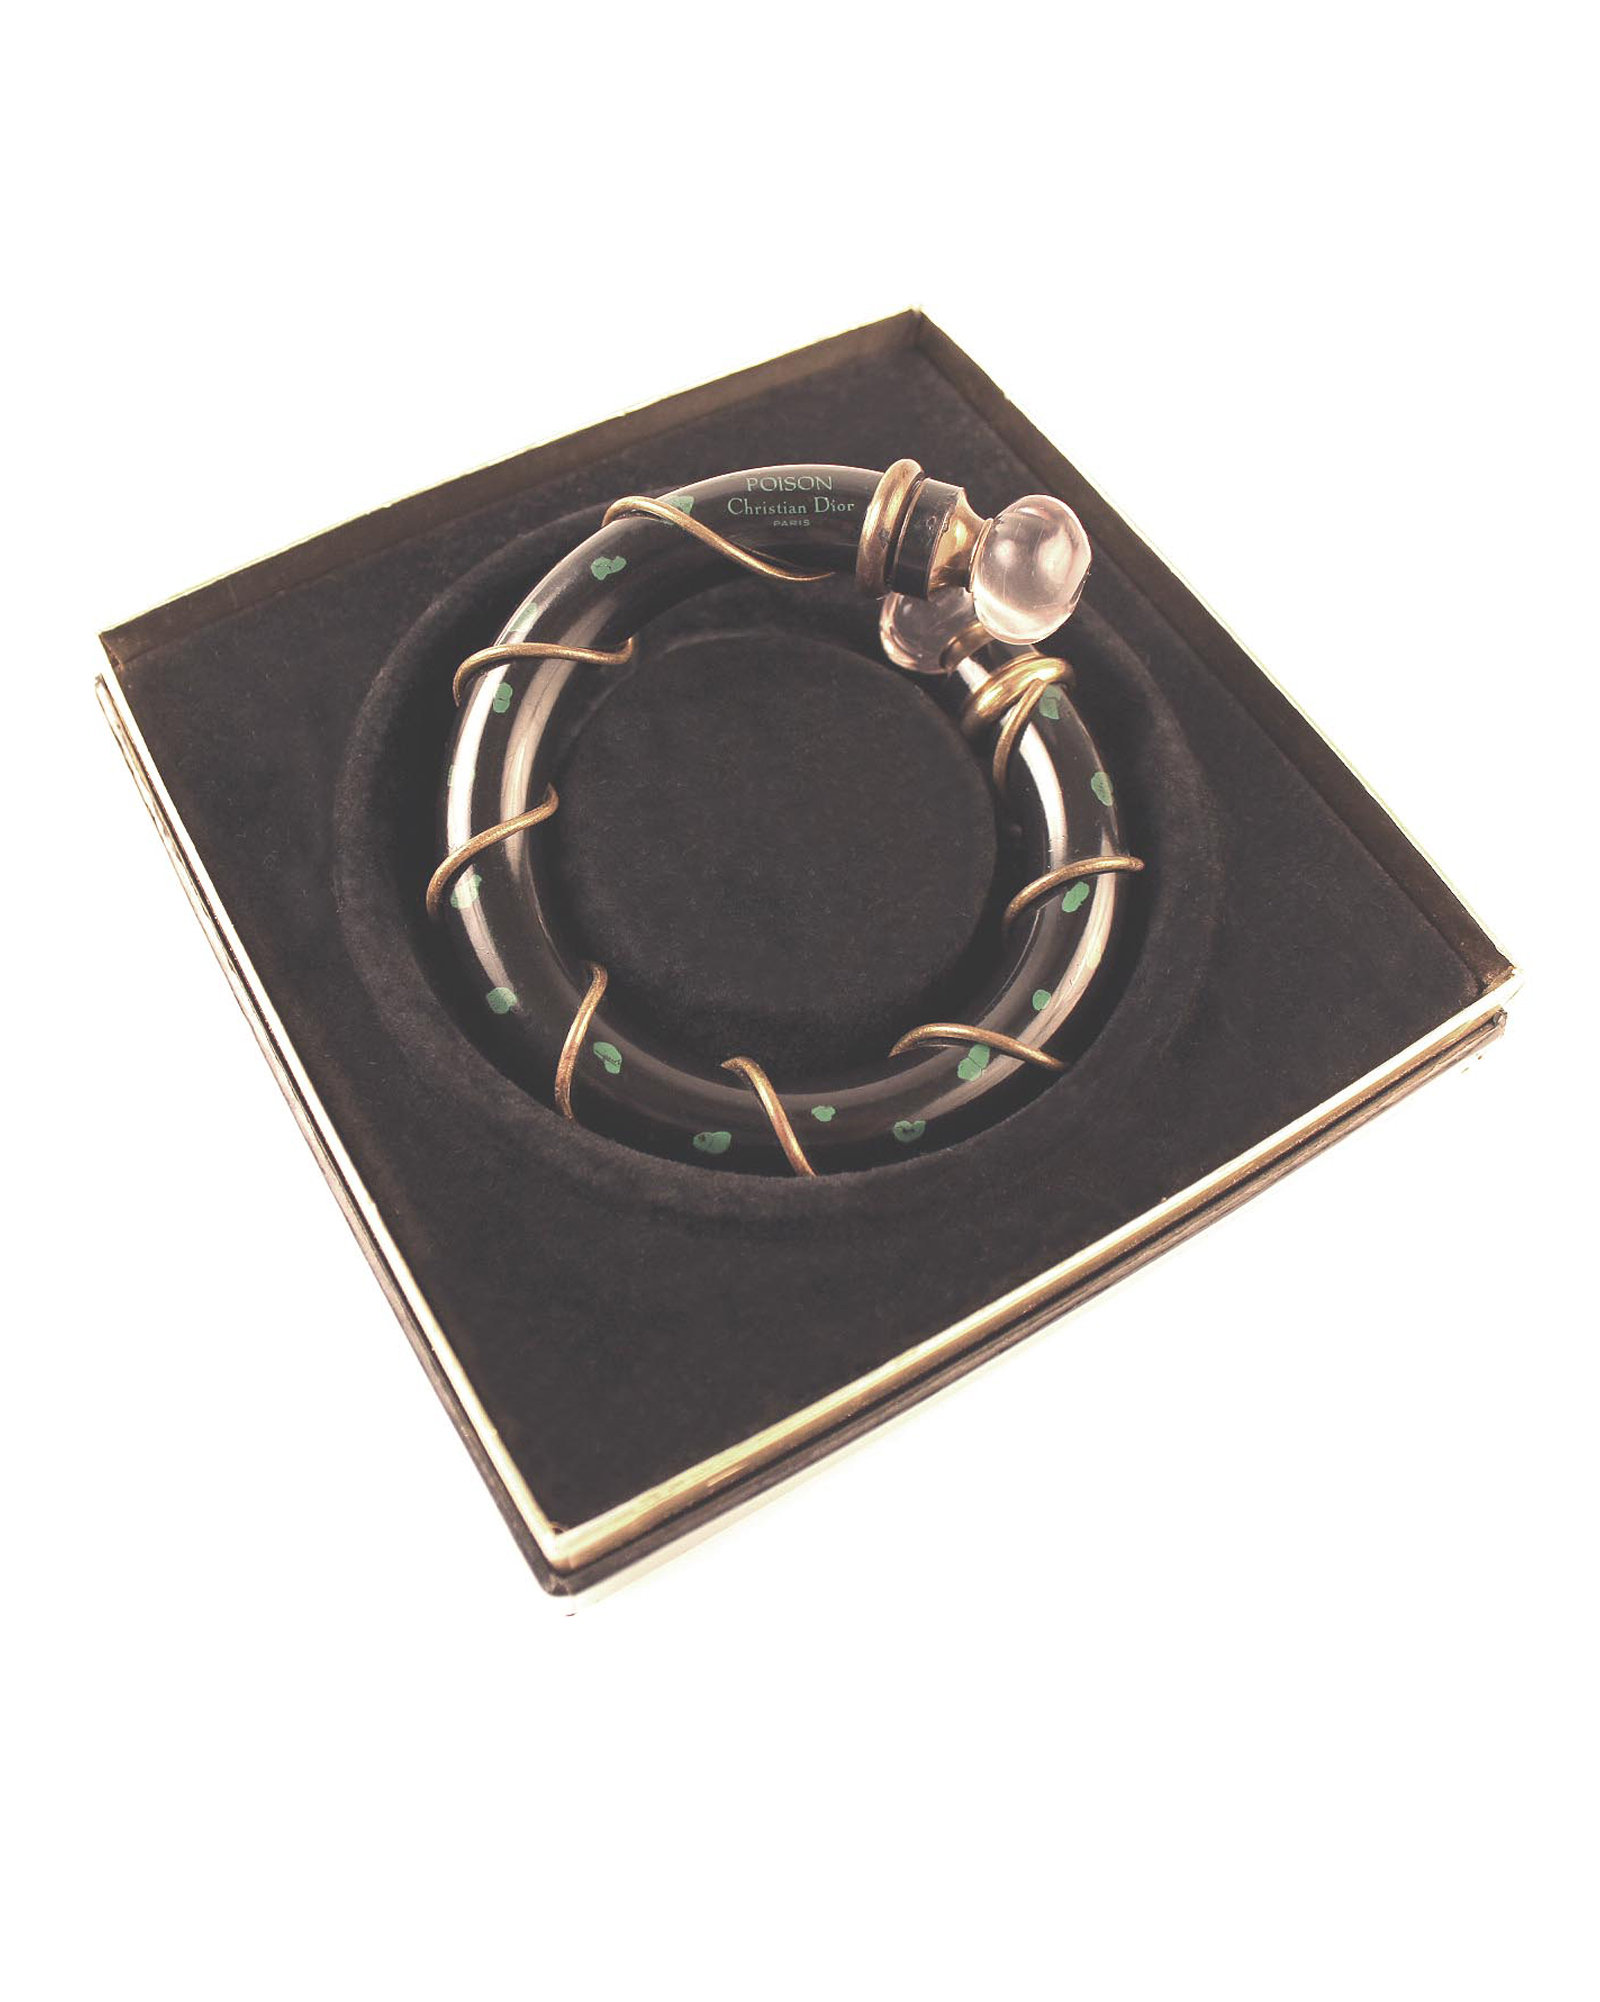 Vintage Christian Dior Poison Perfume Flask Bracelet